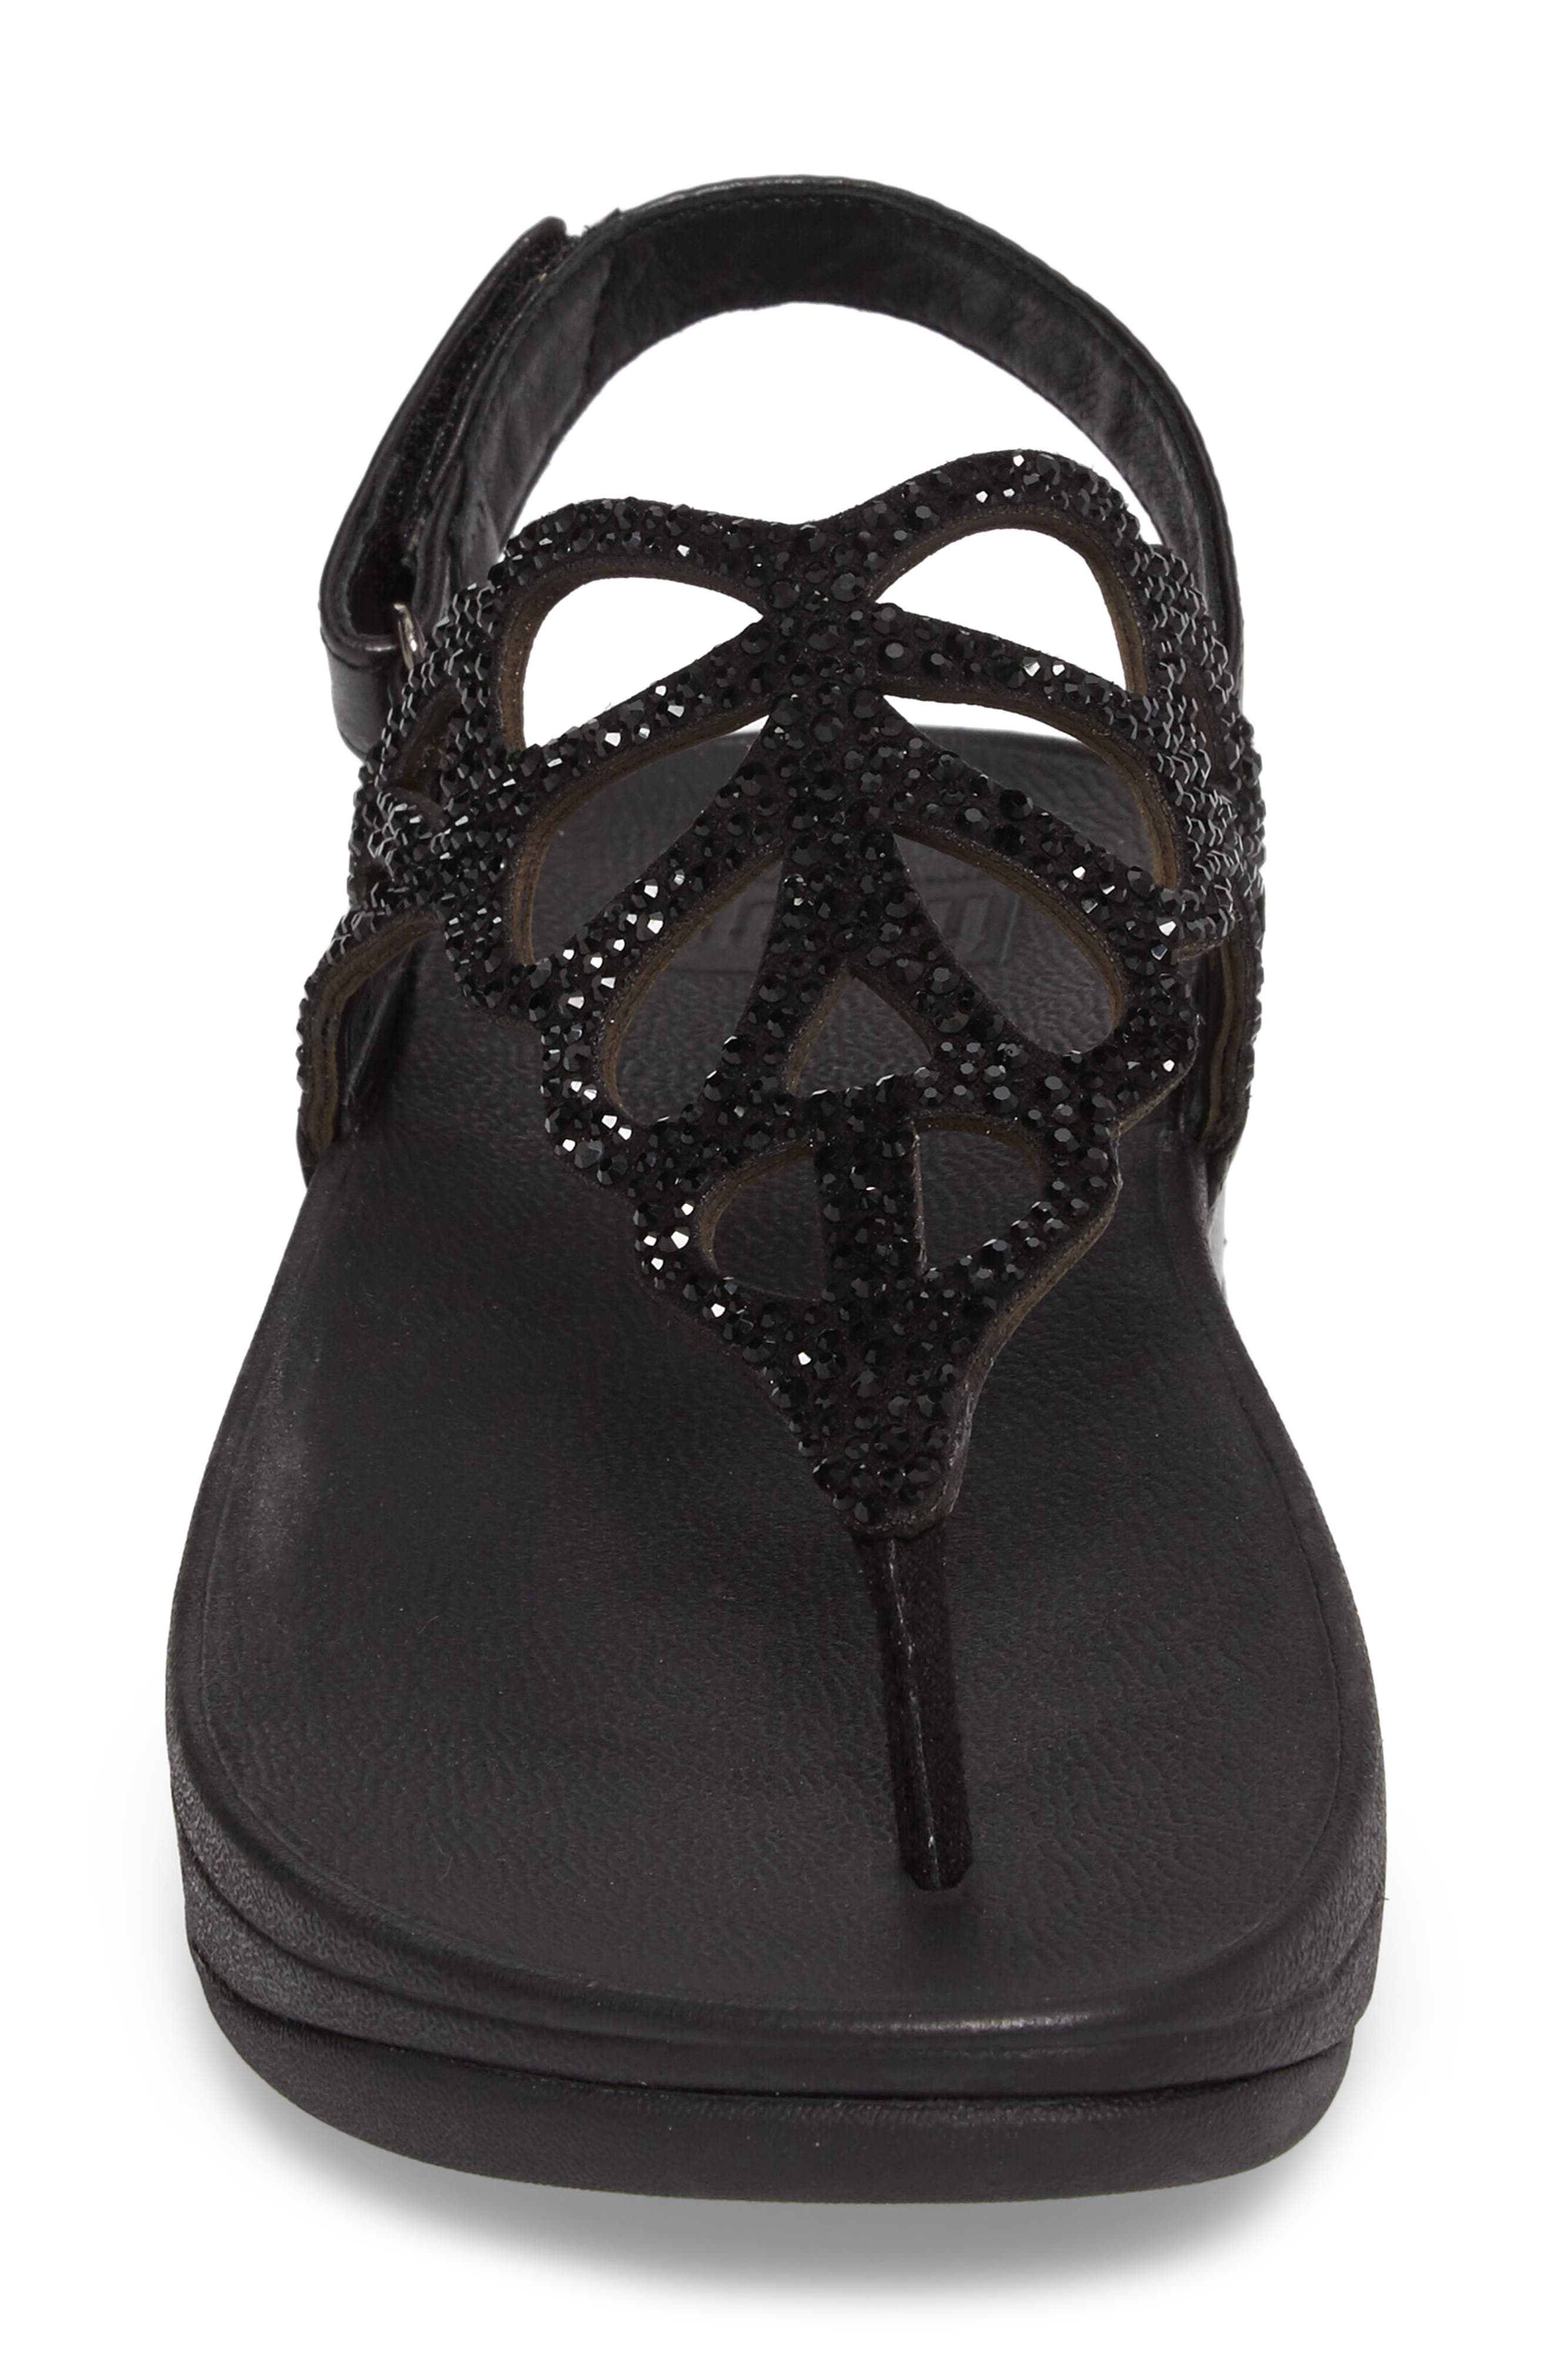 Bumble Crystal Embellished Sandal,                             Alternate thumbnail 4, color,                             Black Leather